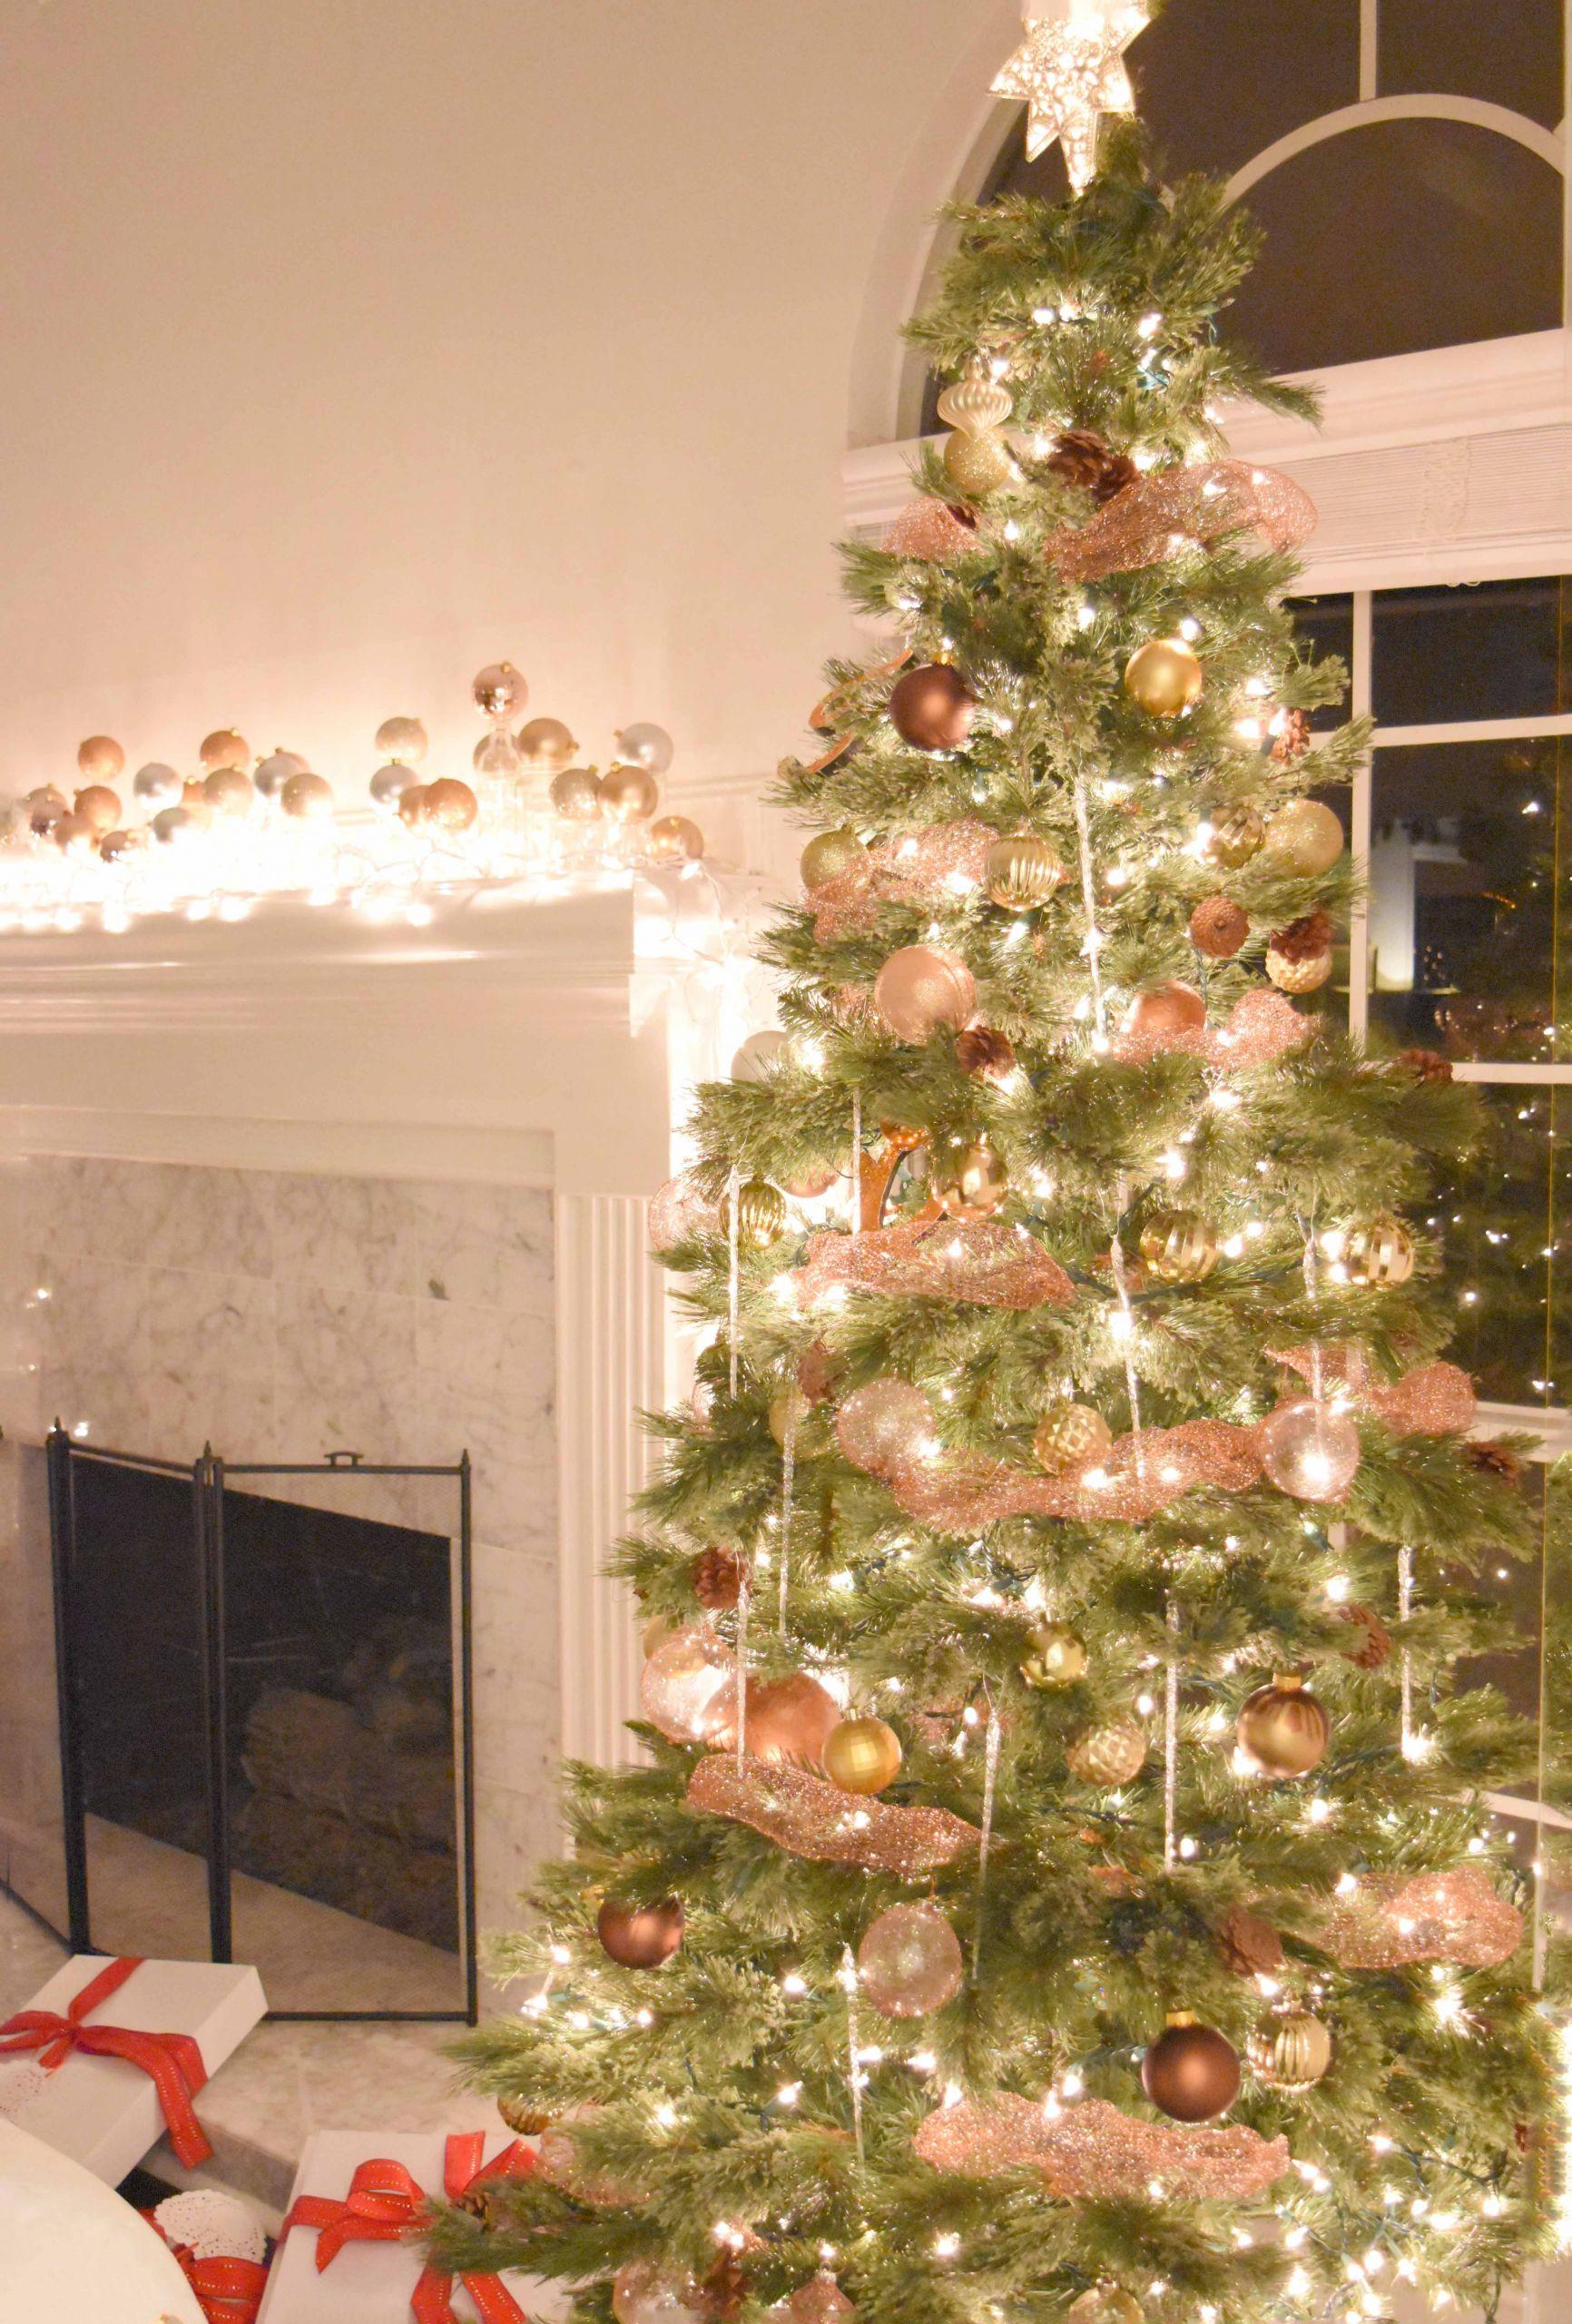 DIY Christmas Tree Garland  DIY Copper Mesh Garland For Your Christmas Tree